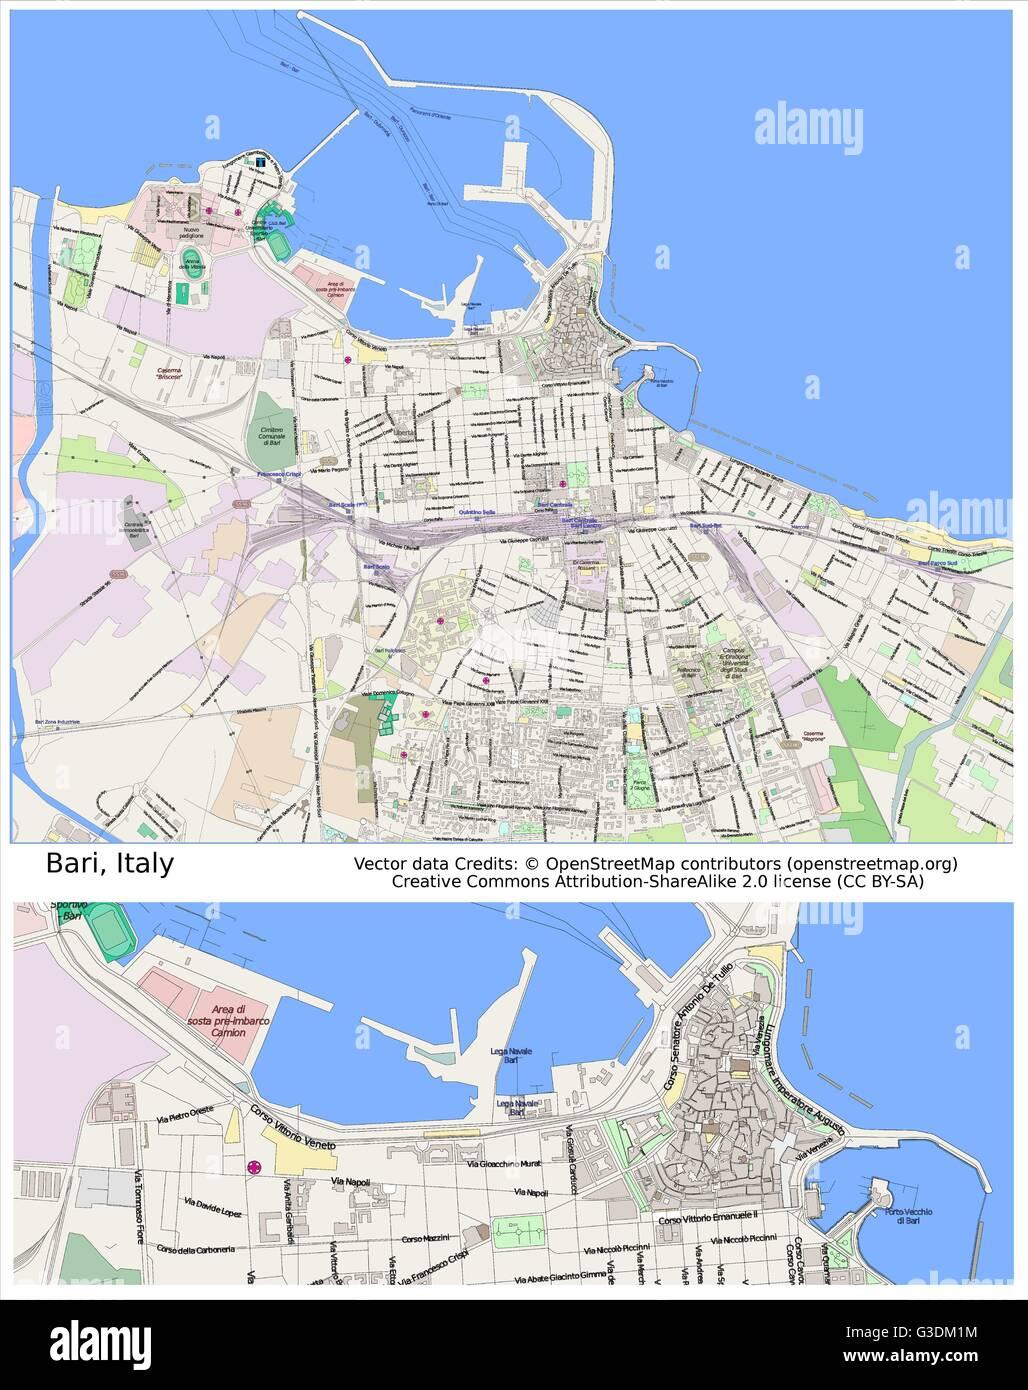 Bari Italy City Map Stock Vector Art Illustration Vector Image - Bari map